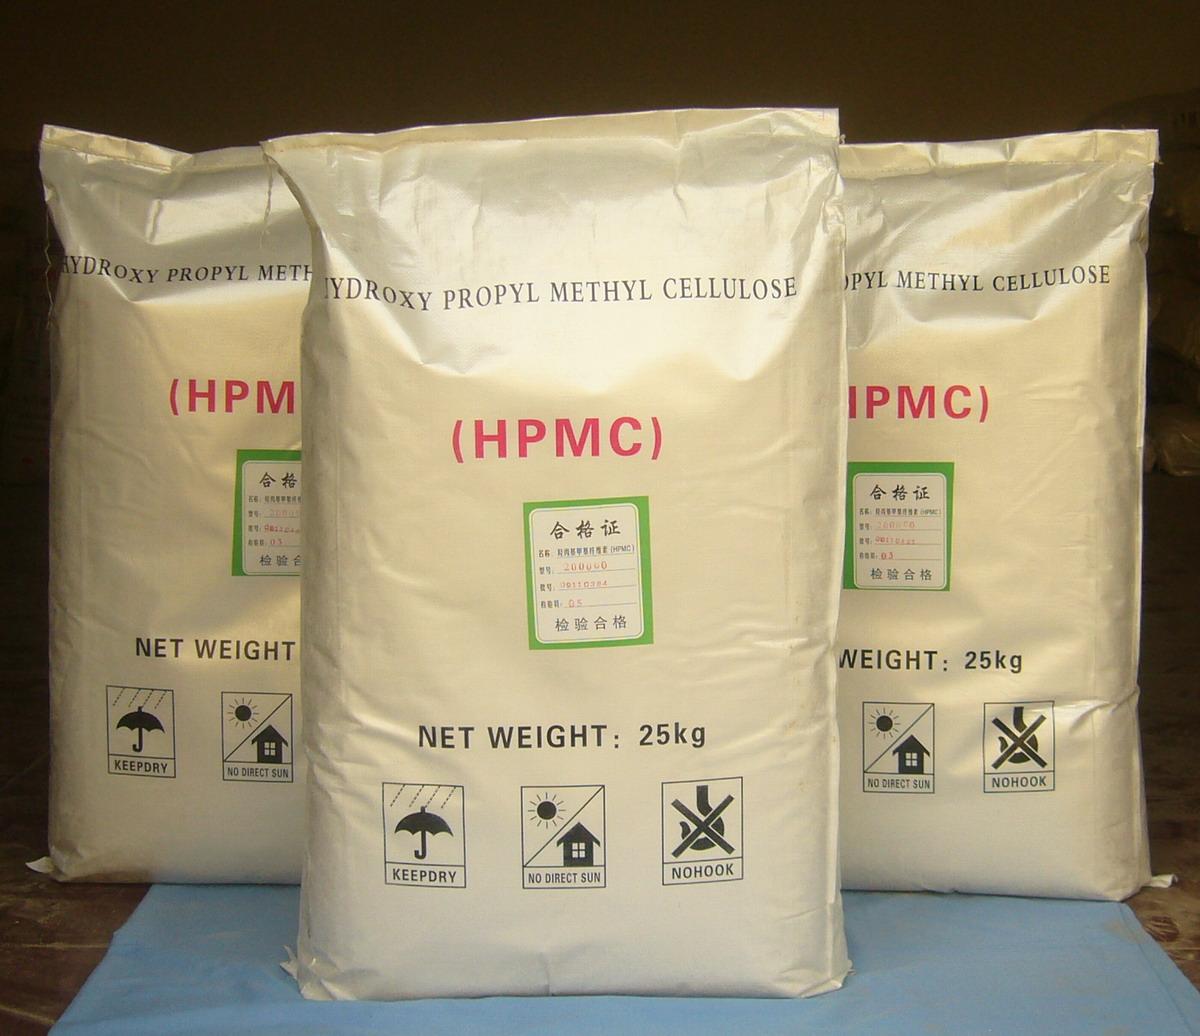 Hydroxypropyl Methyl Cellulose/HPMC